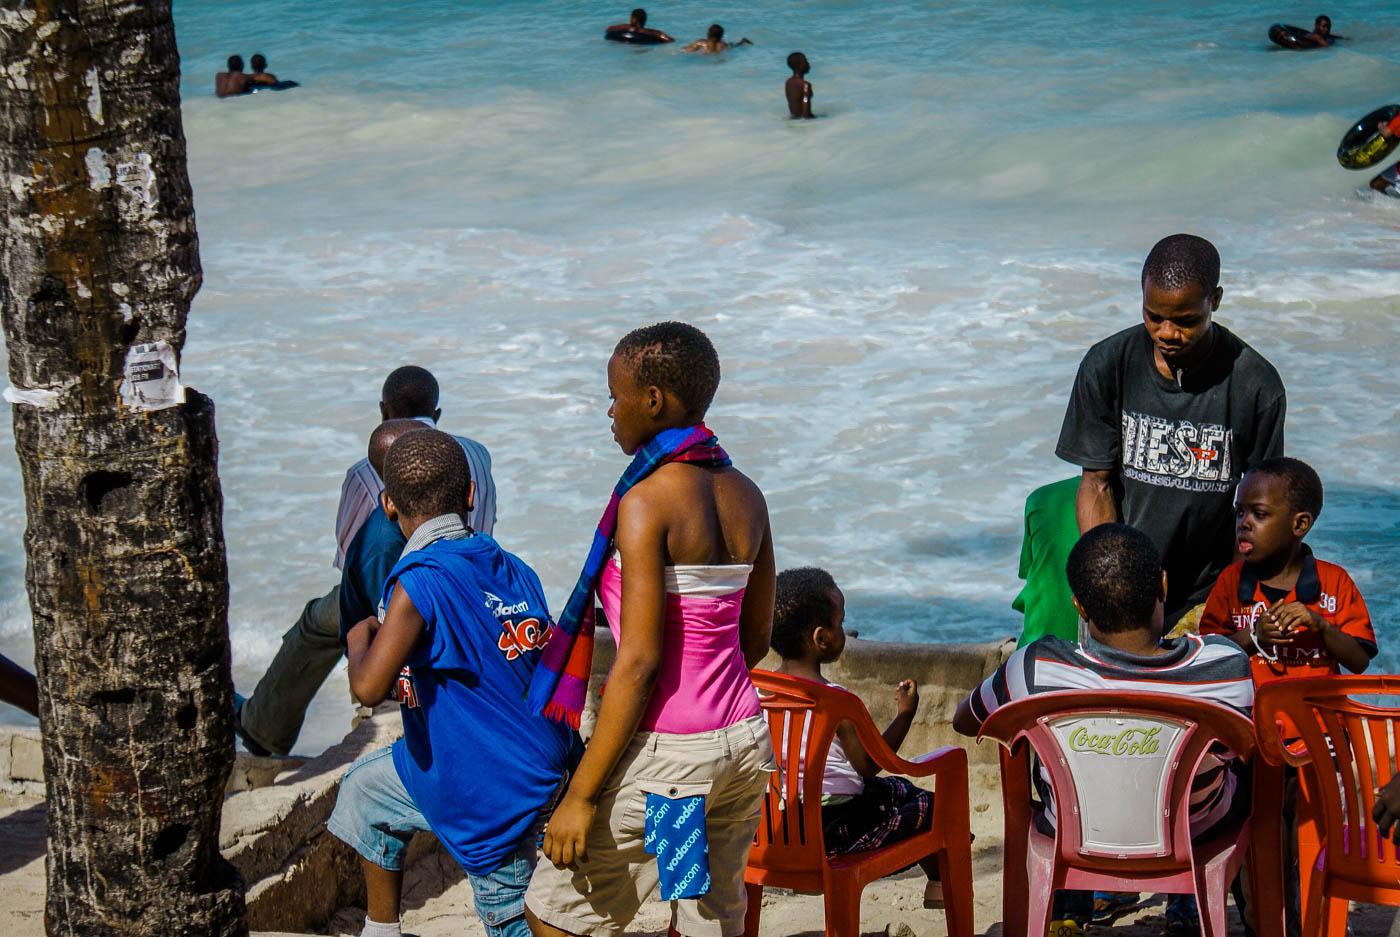 Coco beach - Dar Es Salaam Tanzania and Zanzibar - an exotic adventure. Beaches I Stone Town I Africa Travel I Dar Es Salaam #traveldestinations #traveltheworld #tanzania